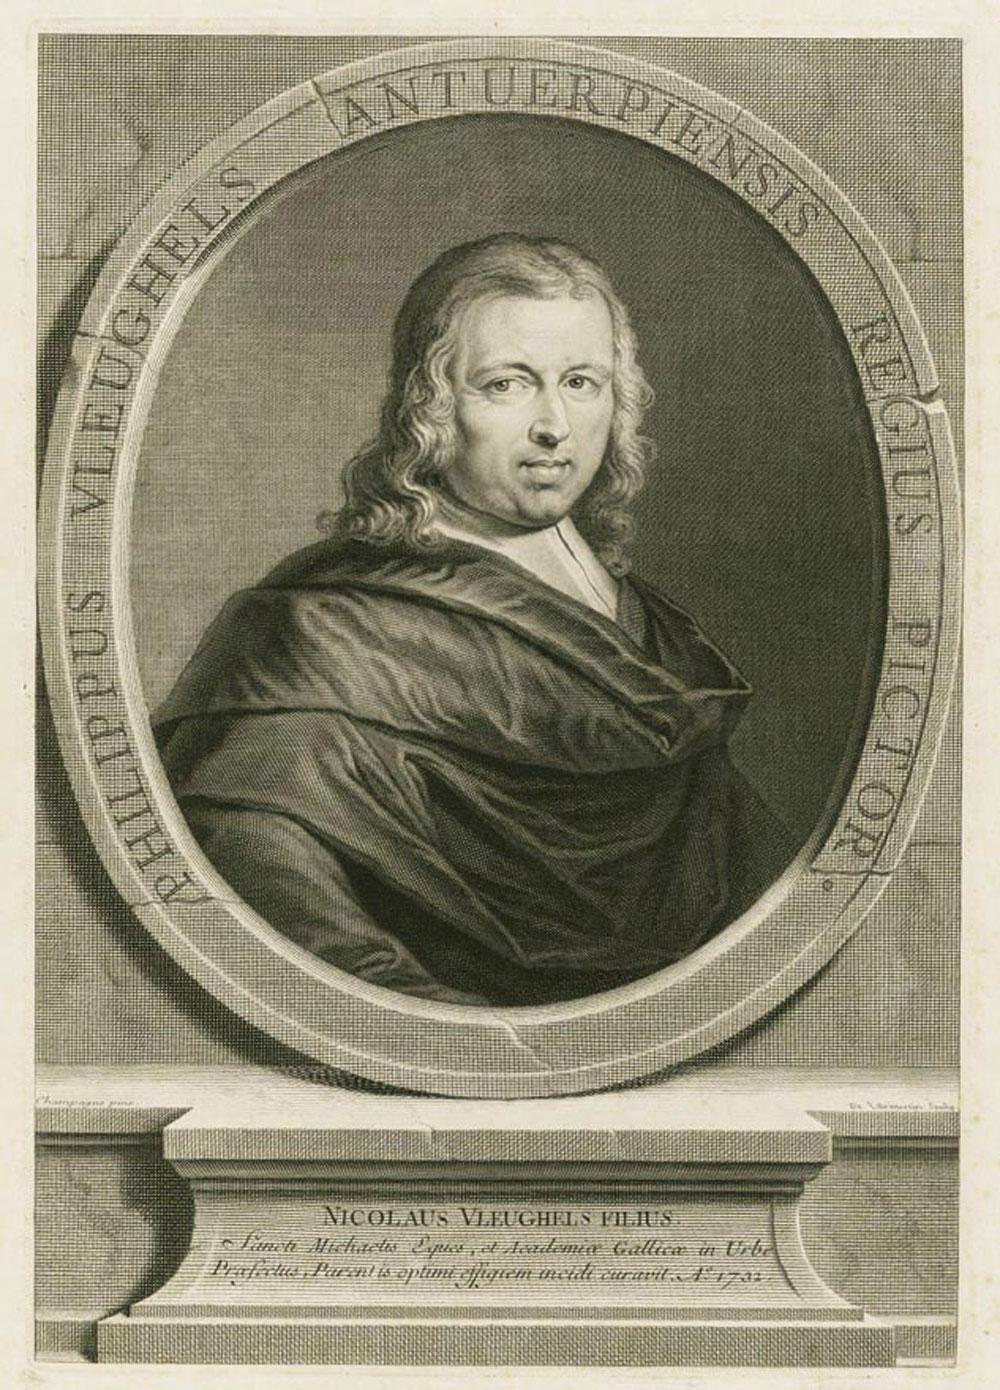 Philippe Vleughels